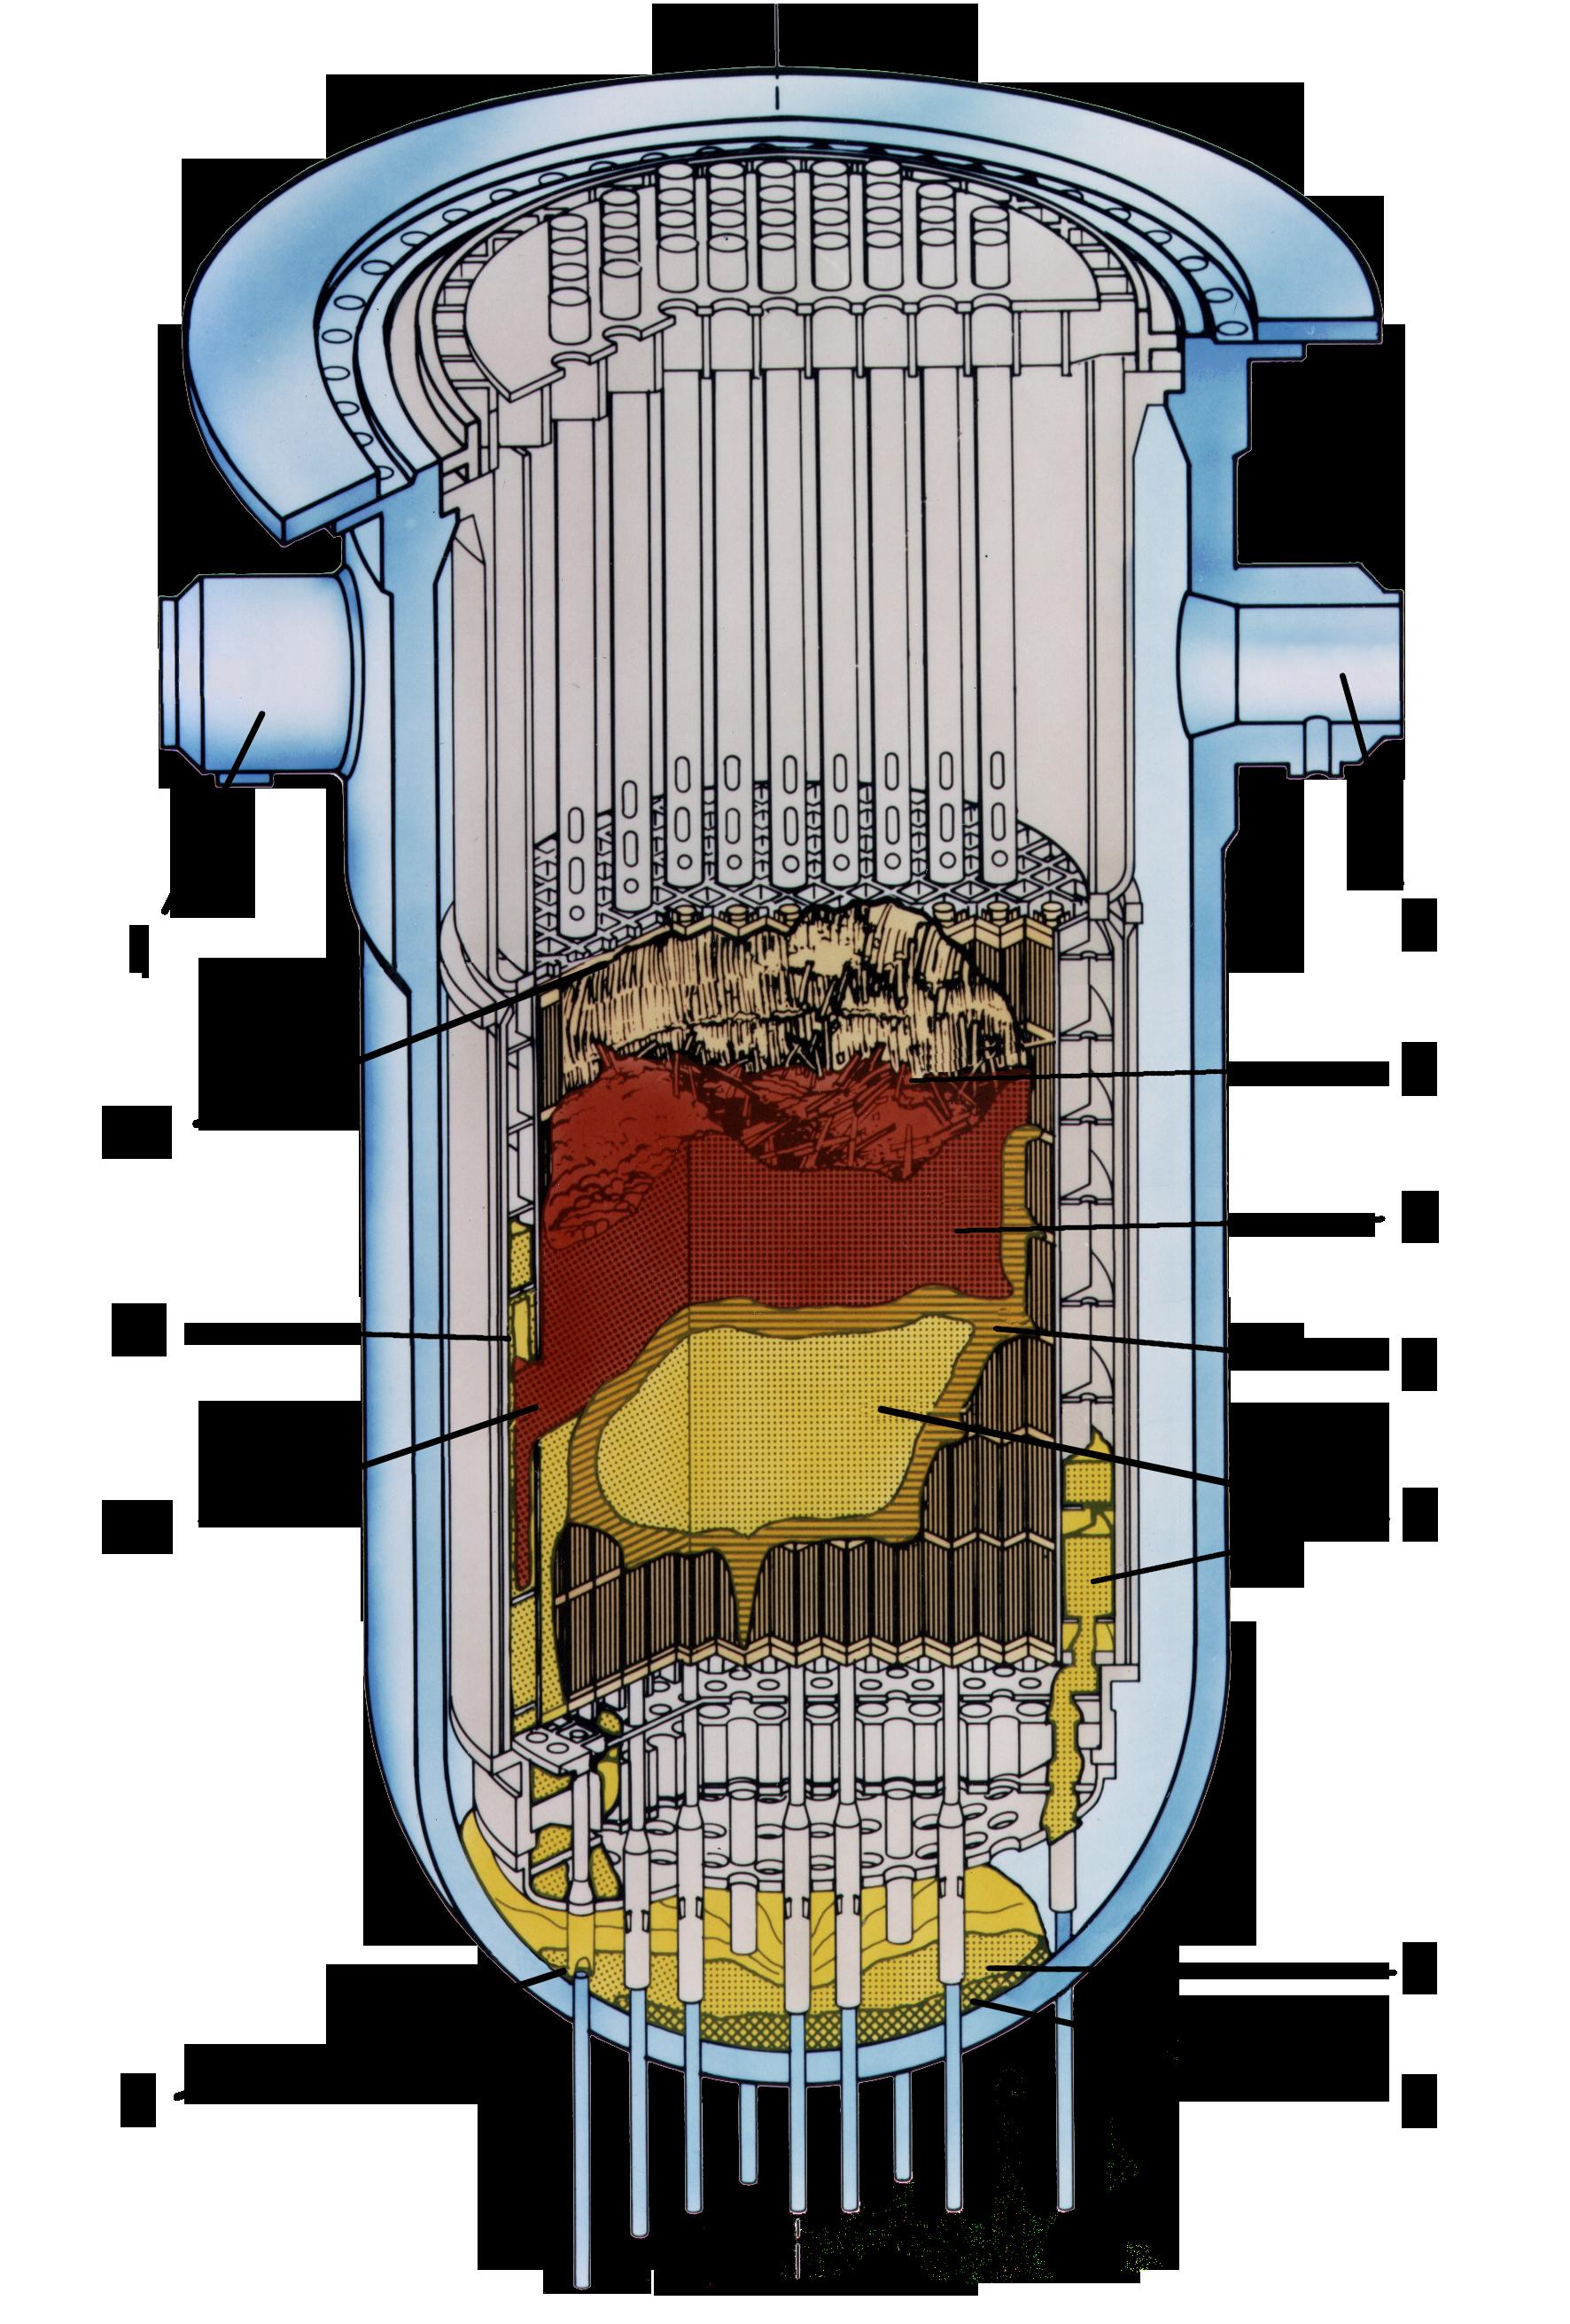 Corium (nuclear reactor) - Wikipedia